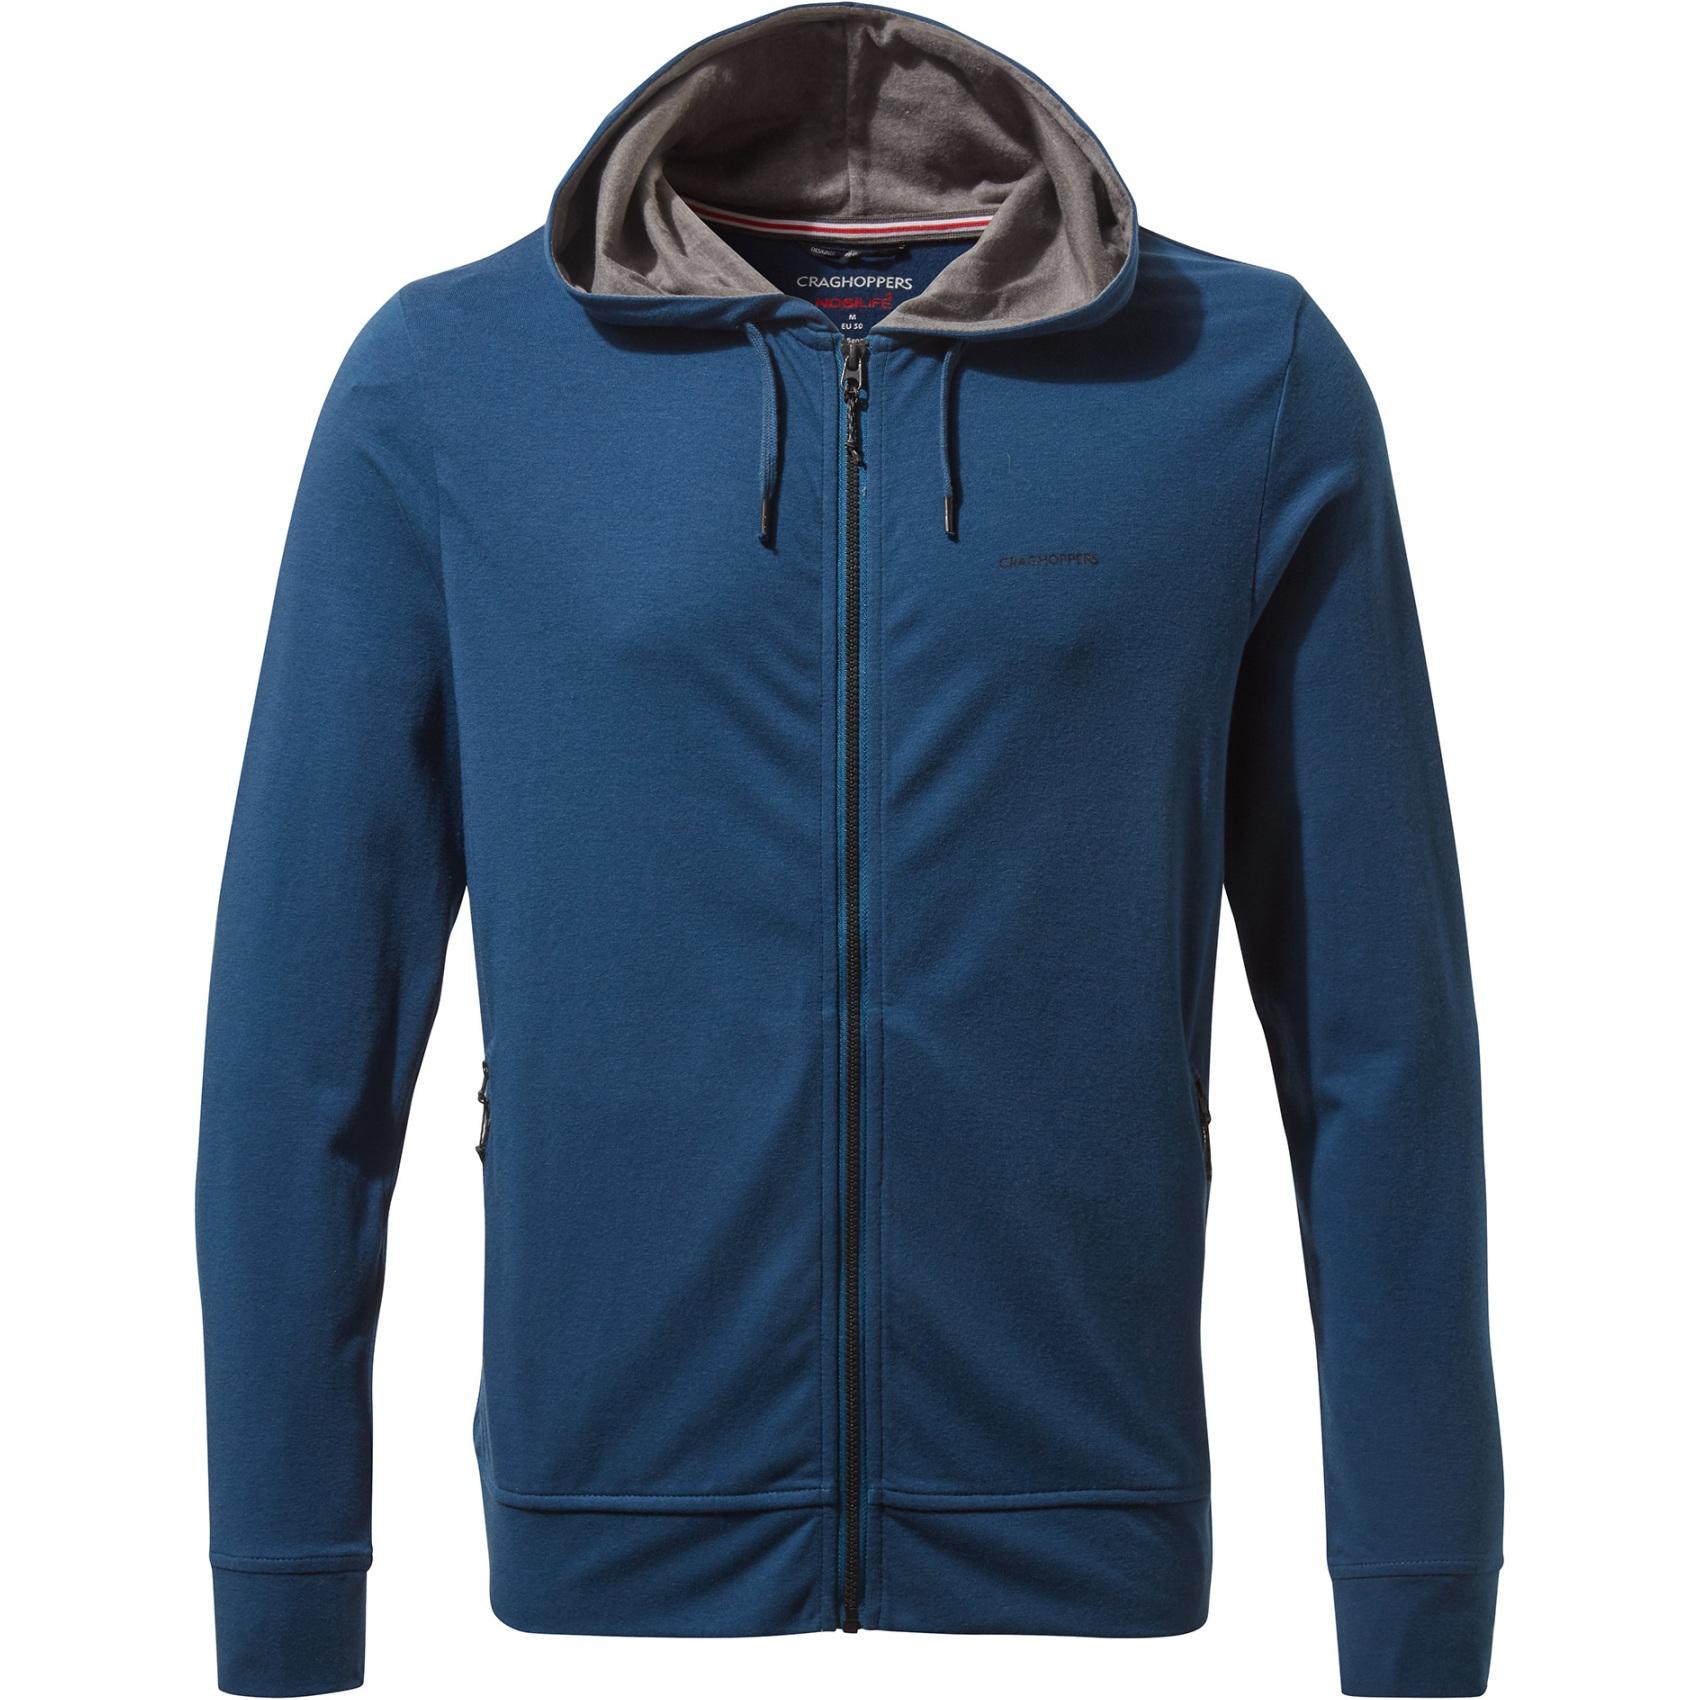 Craghoppers NosiLife Tilpa Hooded Jacket - Poseidon Blue